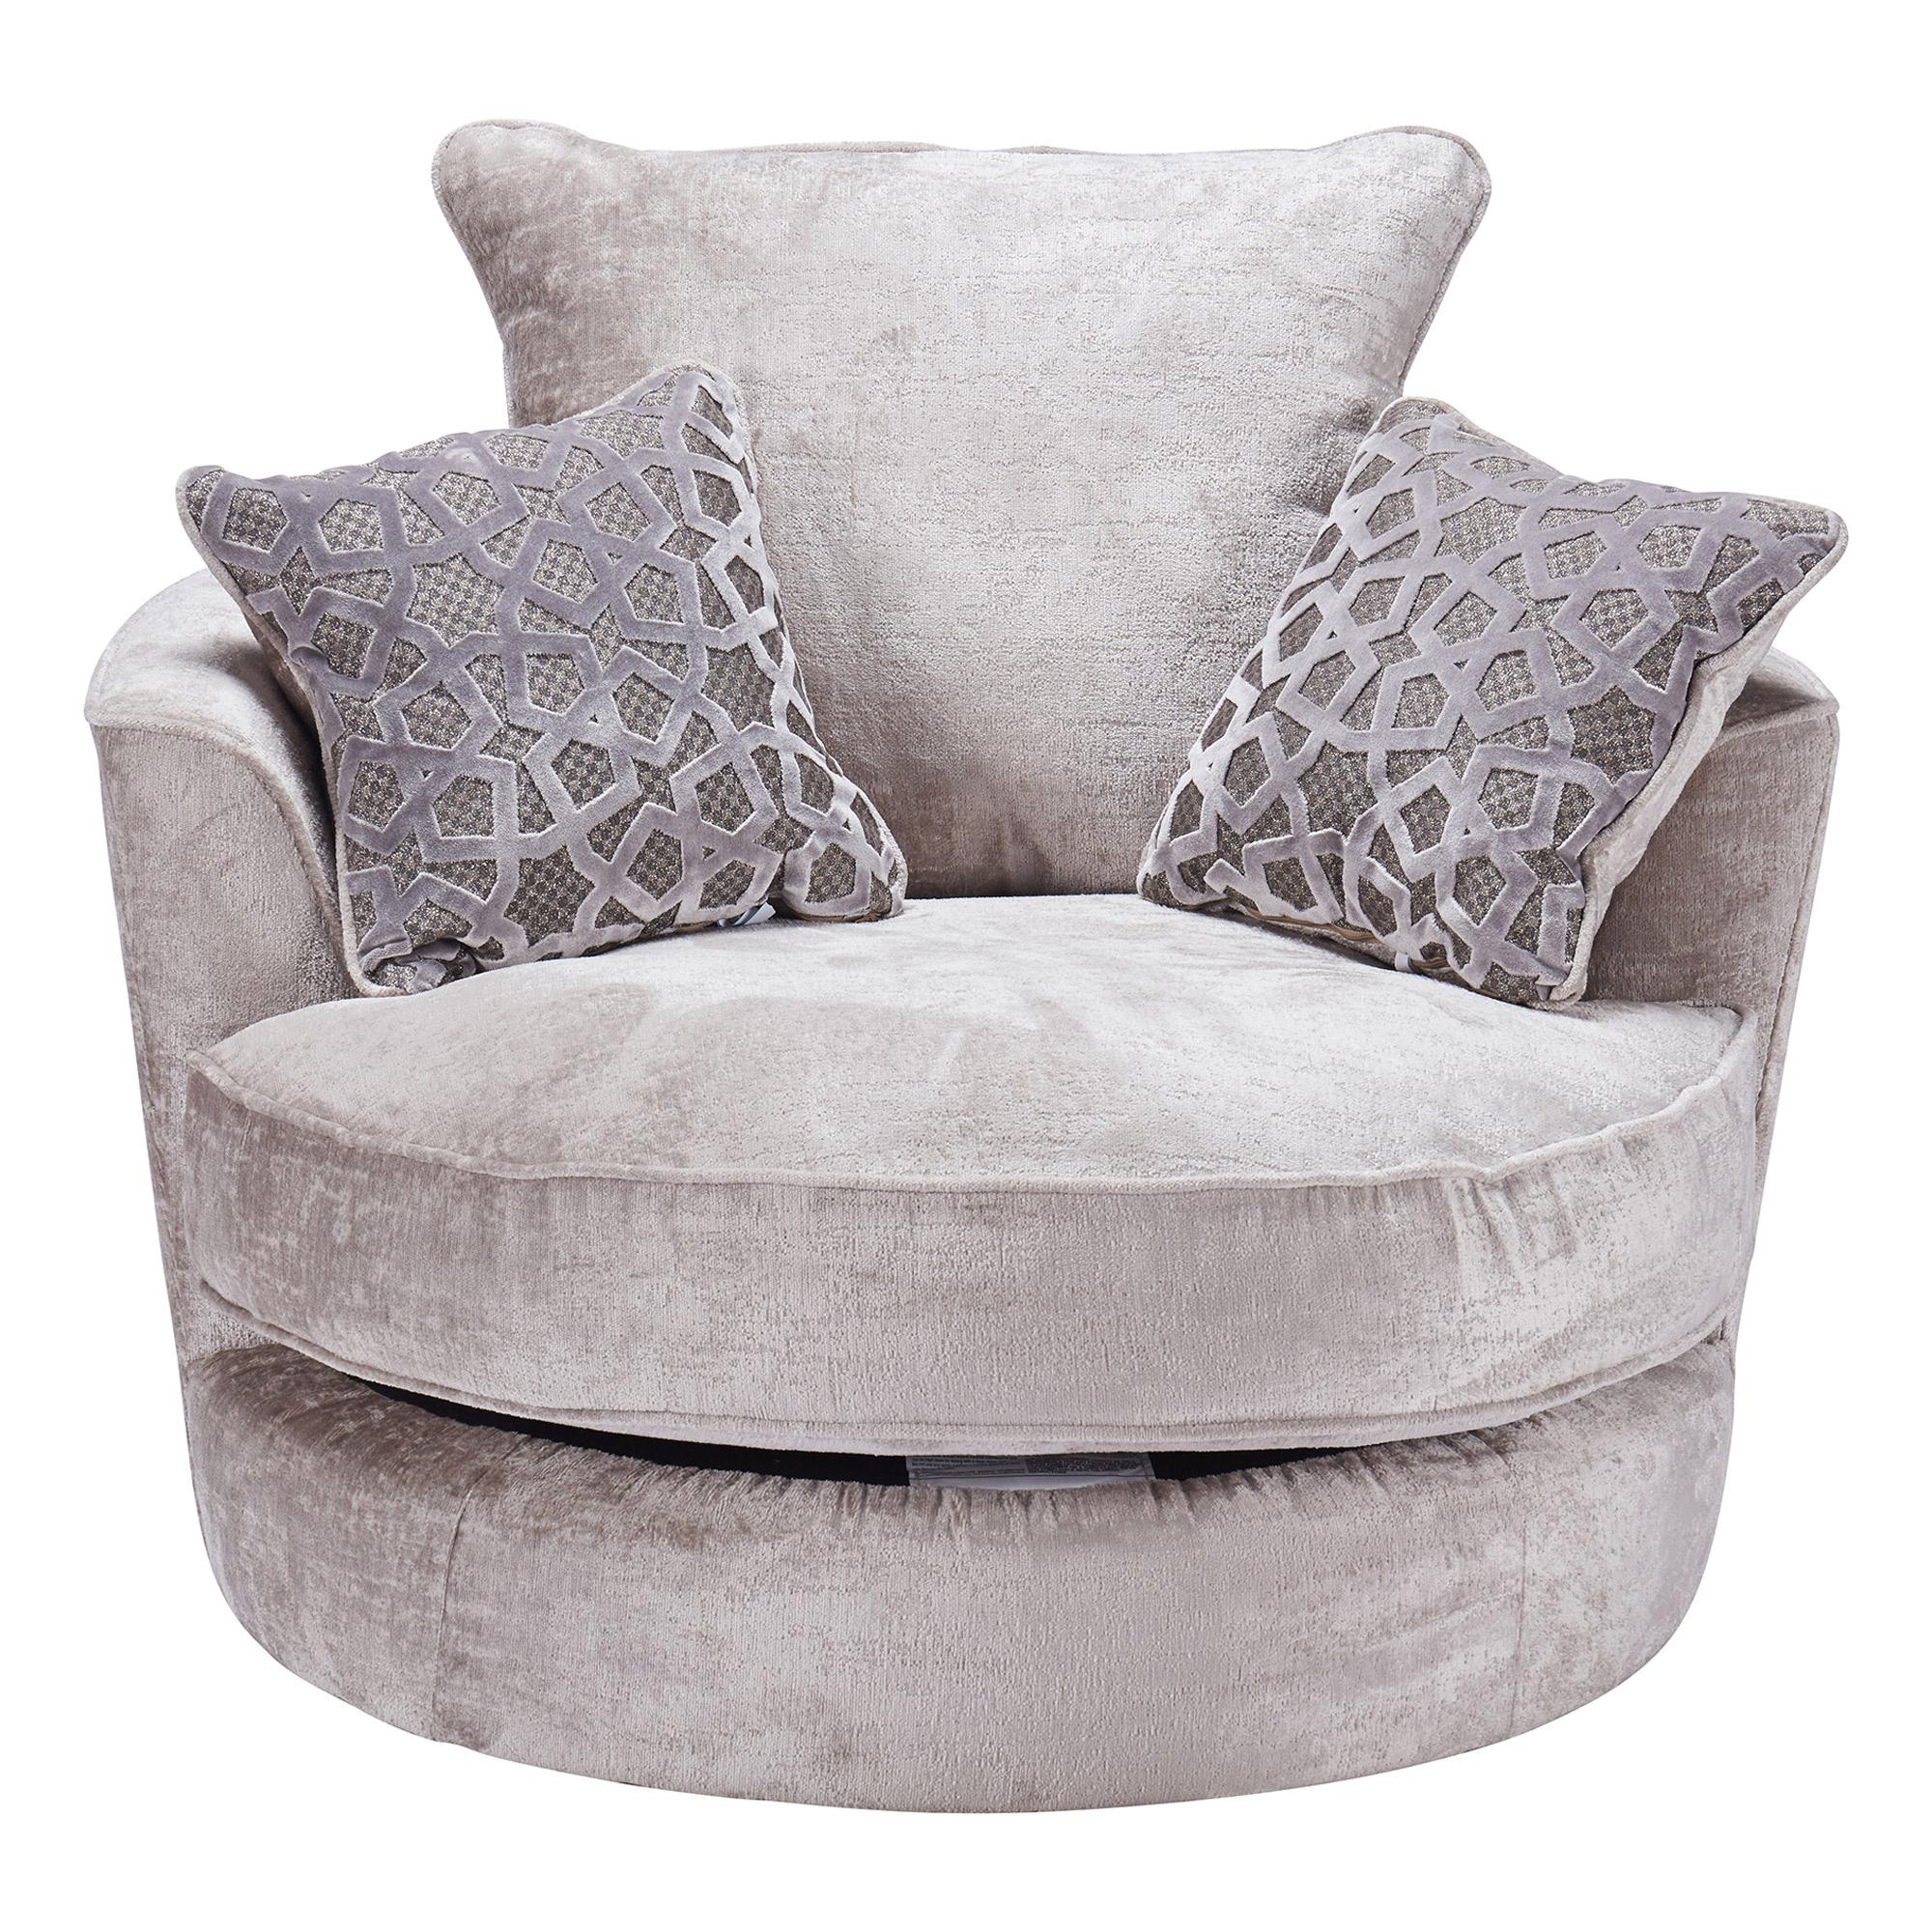 Genus Silver Fabric Swivel Cuddler Chair Inside Cuddler Swivel Sofa Chairs (View 5 of 15)